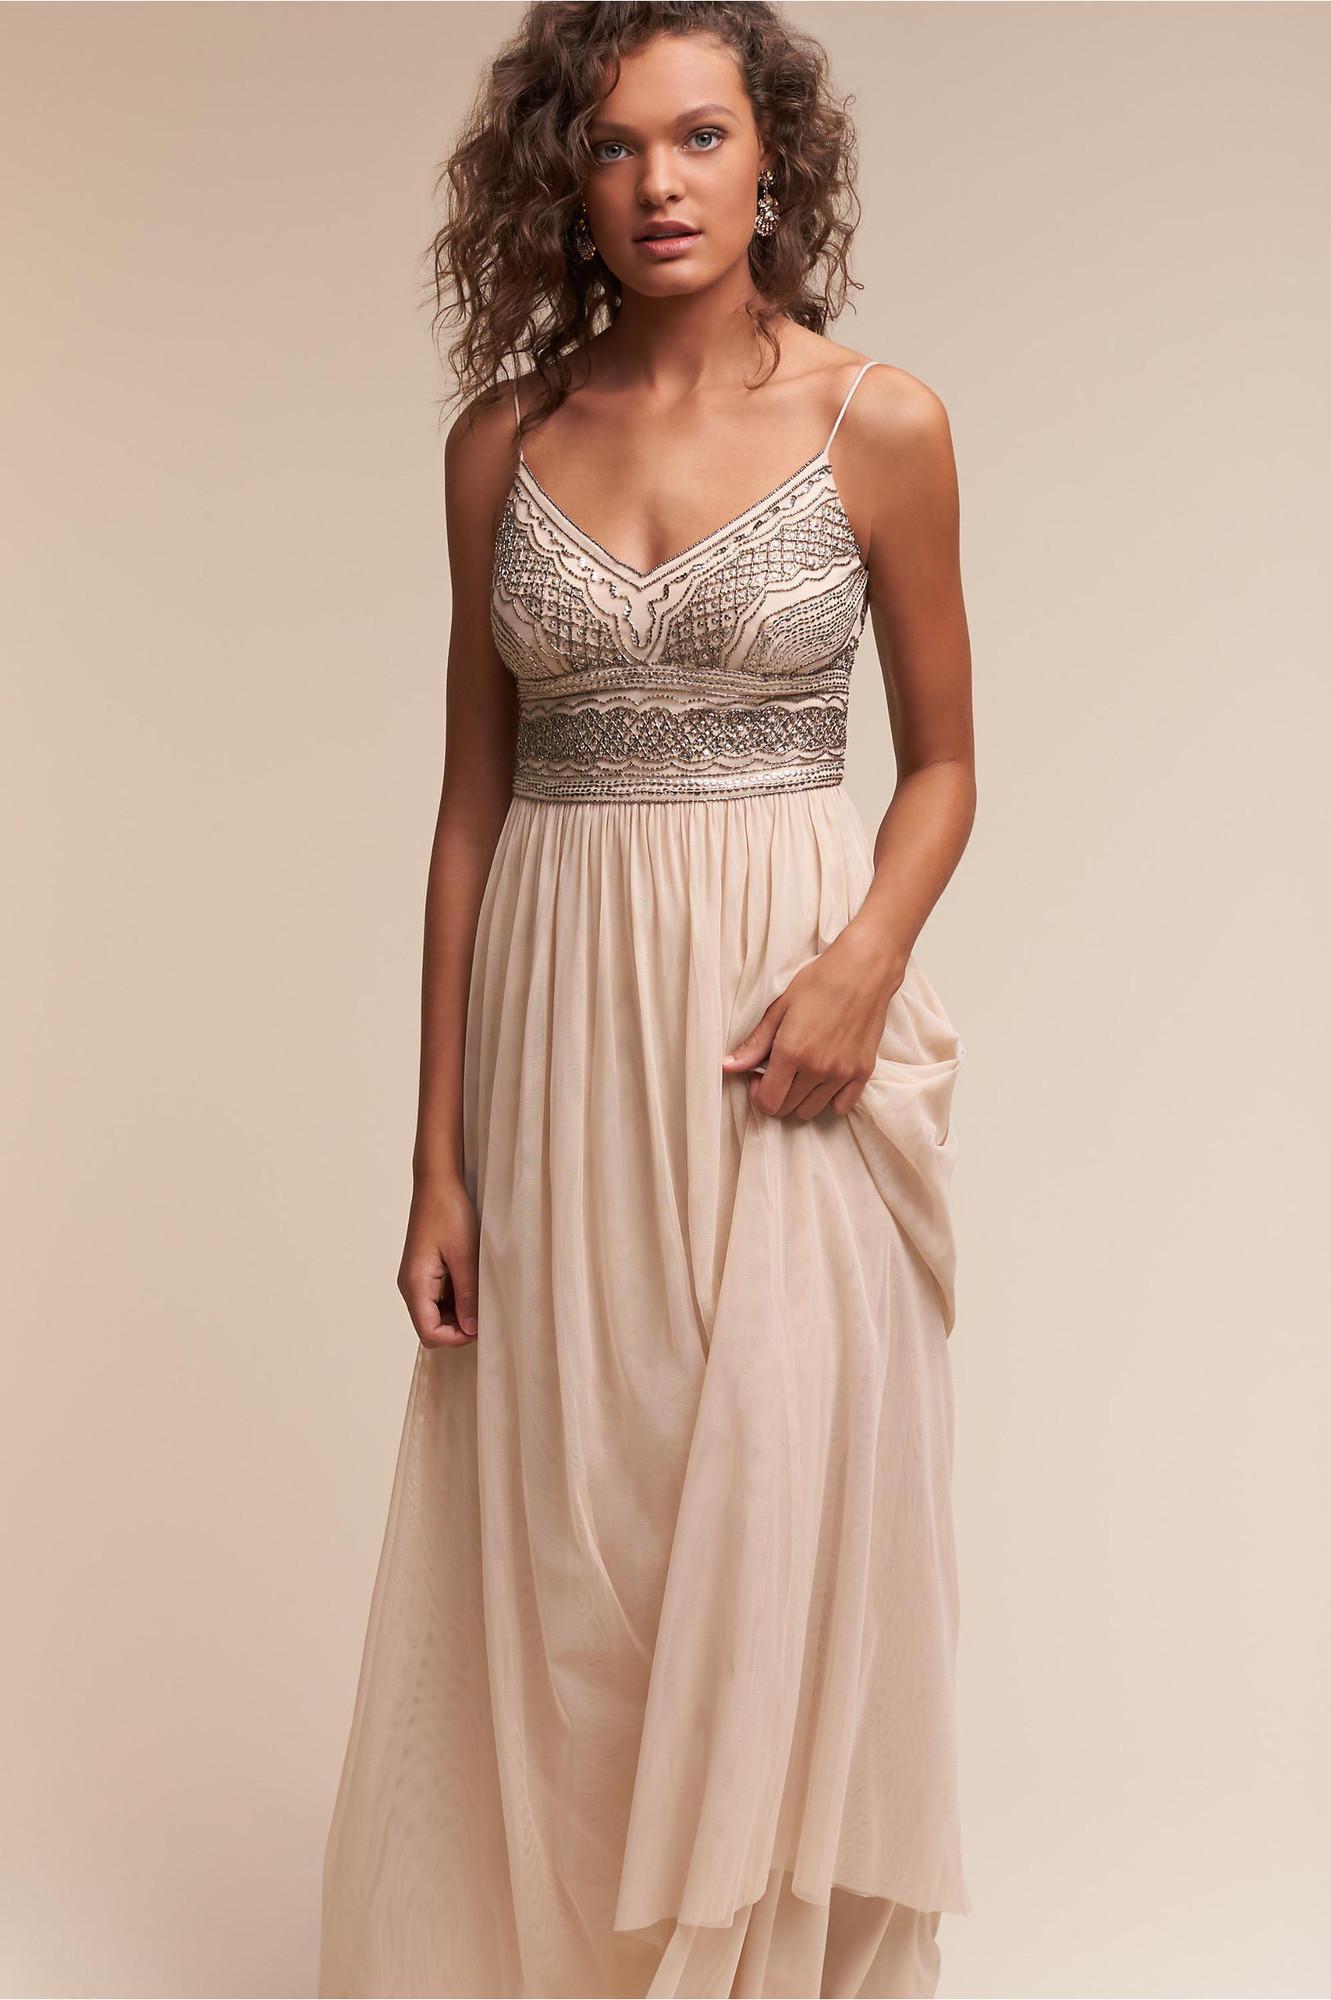 Adrianna Papell Sheath Bridesmaid Dress by BHLDN ...